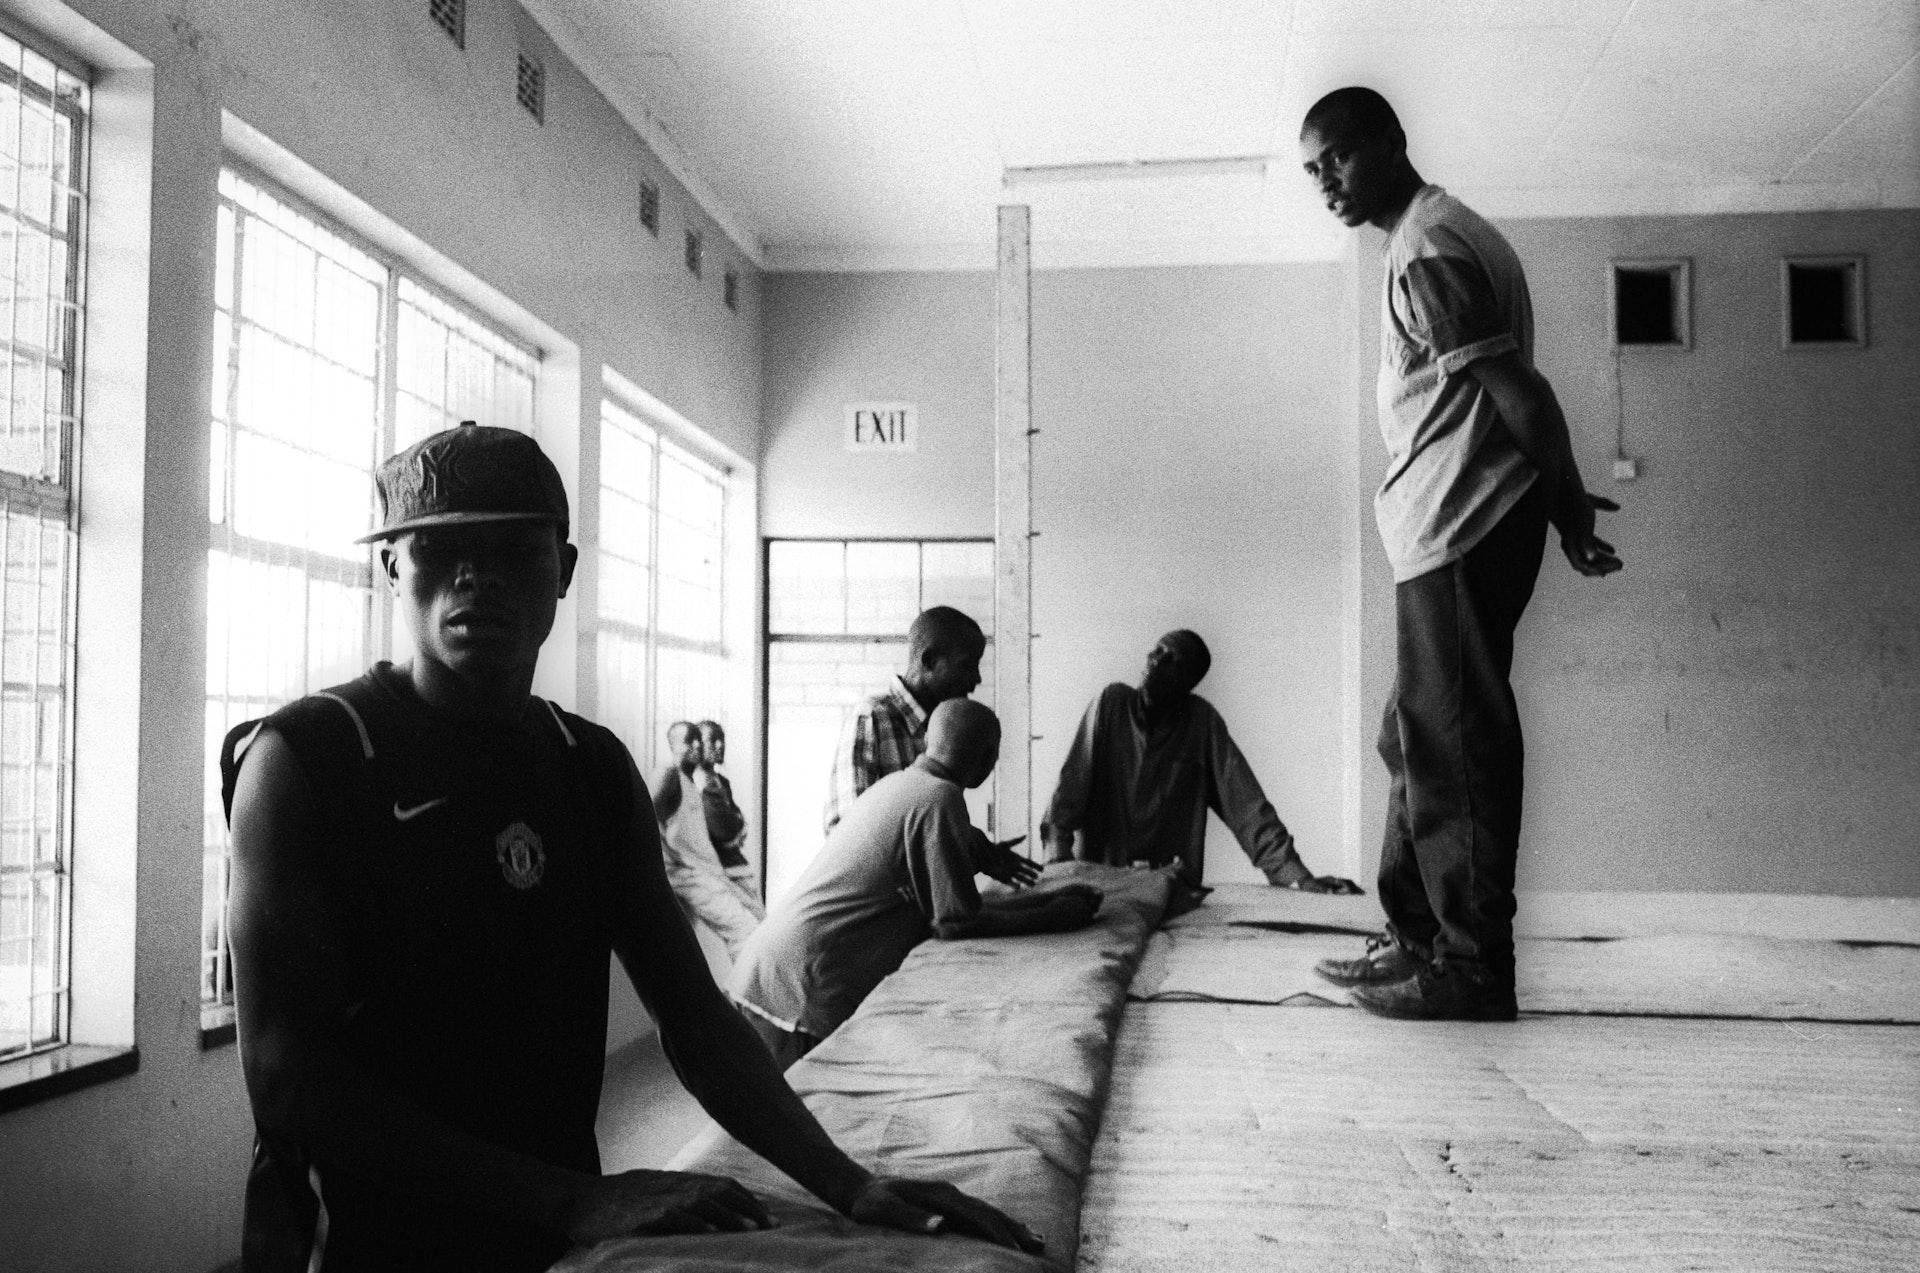 100318_Kibera-Olympic_002_16